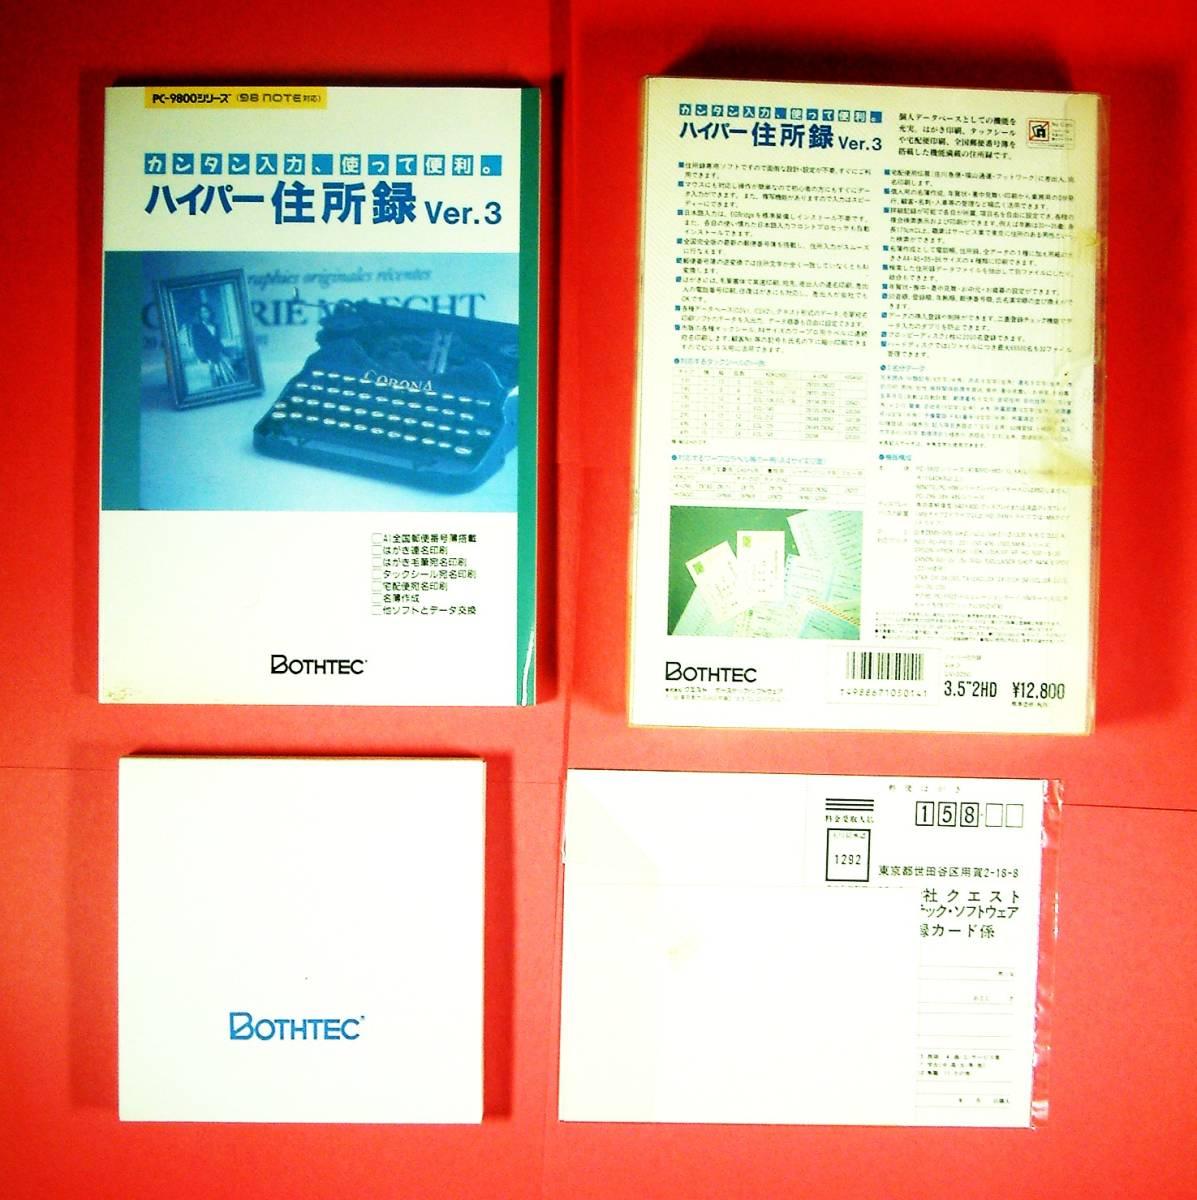 【3702】 Bothtec ハイパー住所録 ver.3 UV-9250 メディア未開封 ソフト ボステック クエスト 対応(MS-DOS,PC-486/386/286,PC-9800,PC-H98)